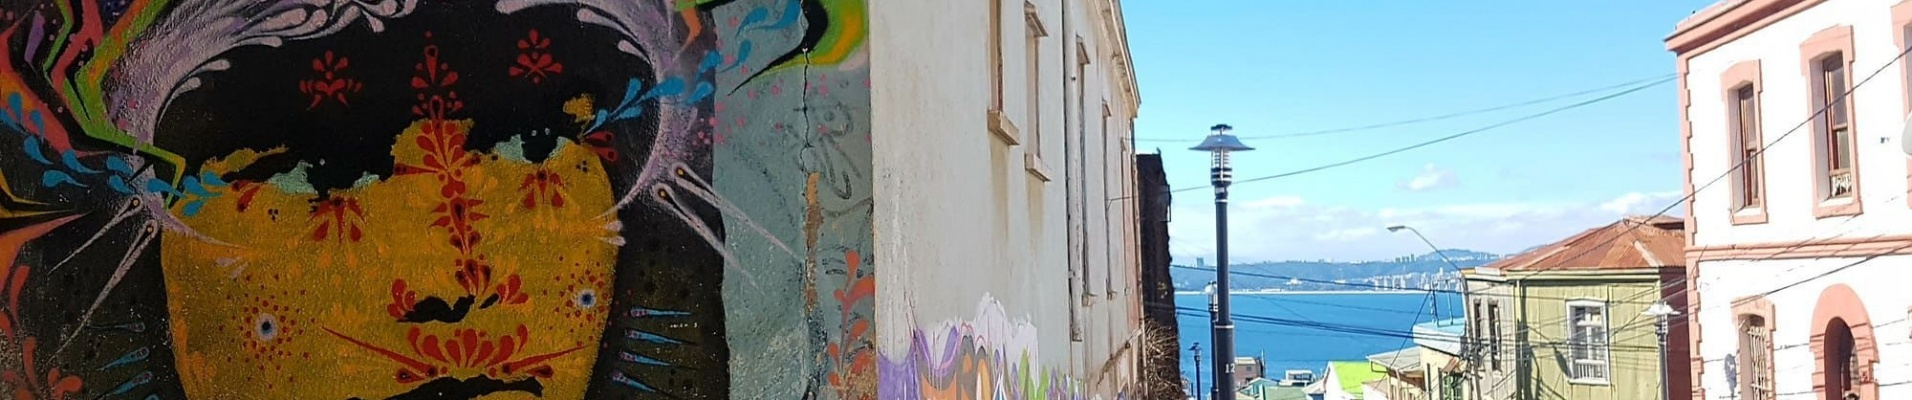 Peinture murale street art Valparaiso, Chili. Agence francophone Chili.